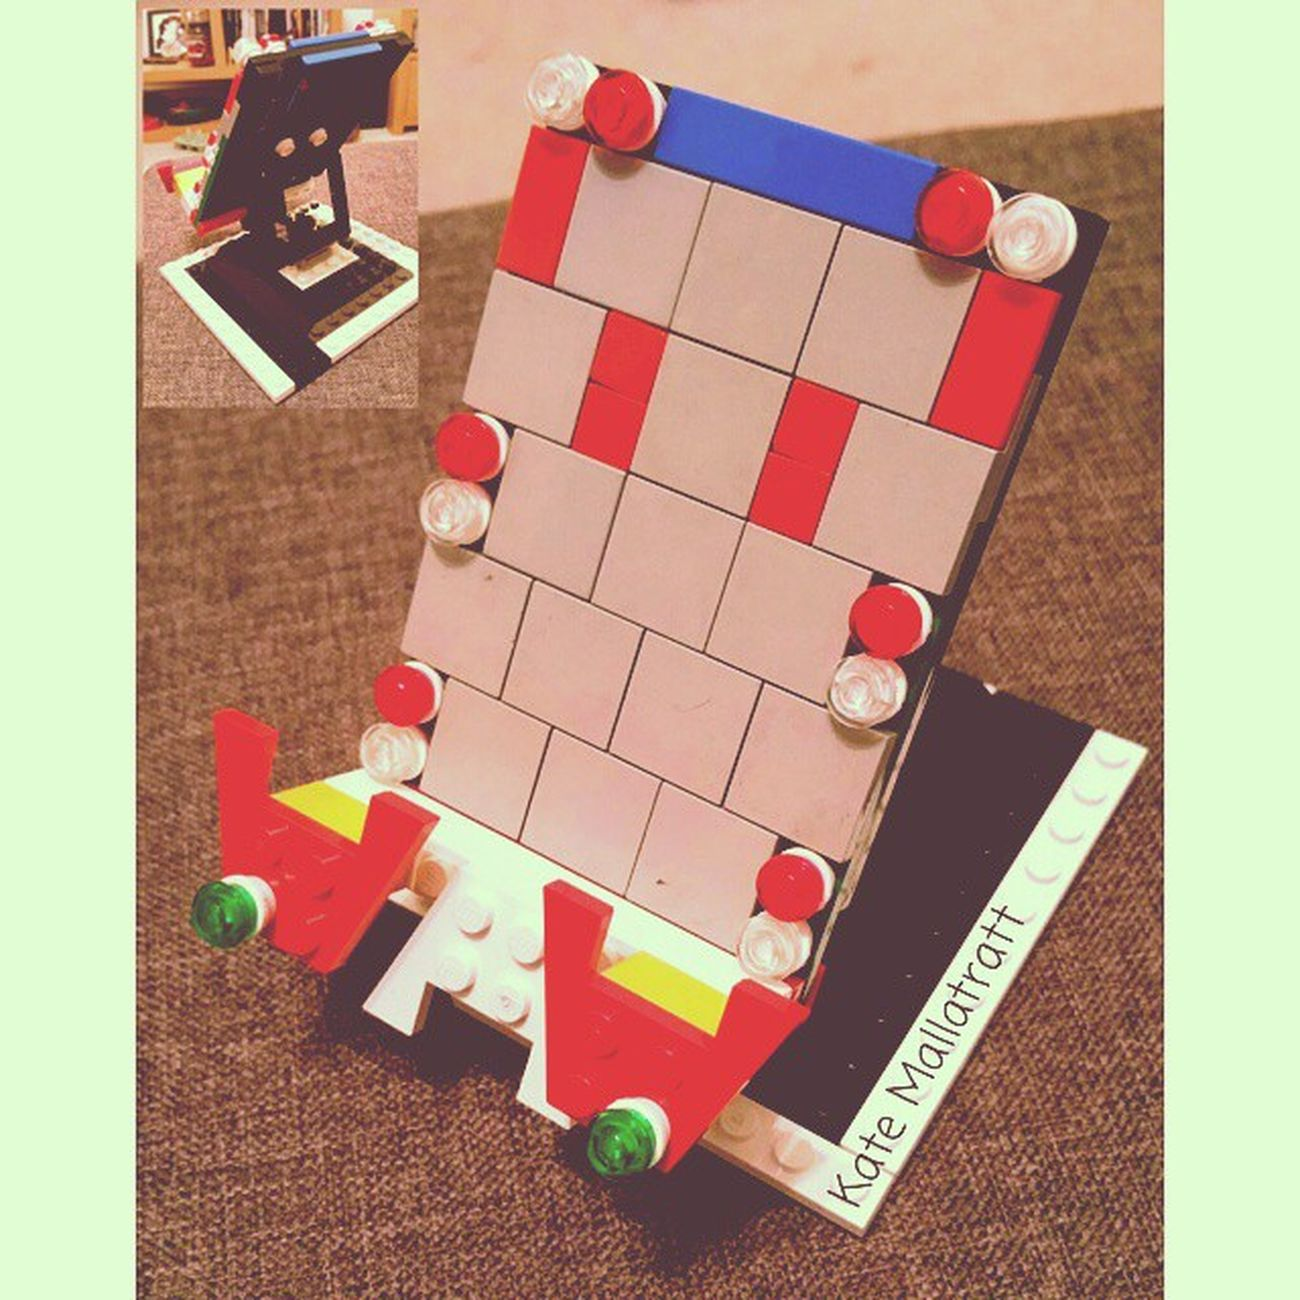 Smart phone holder I made out of my very old (& dirty) Lego bricks! Katemarie_uk LEGO Today Legoinstagram 1977 Legoig Legoigers Legolove LegoLover Childhood Childhoodmemories 230615 23062015